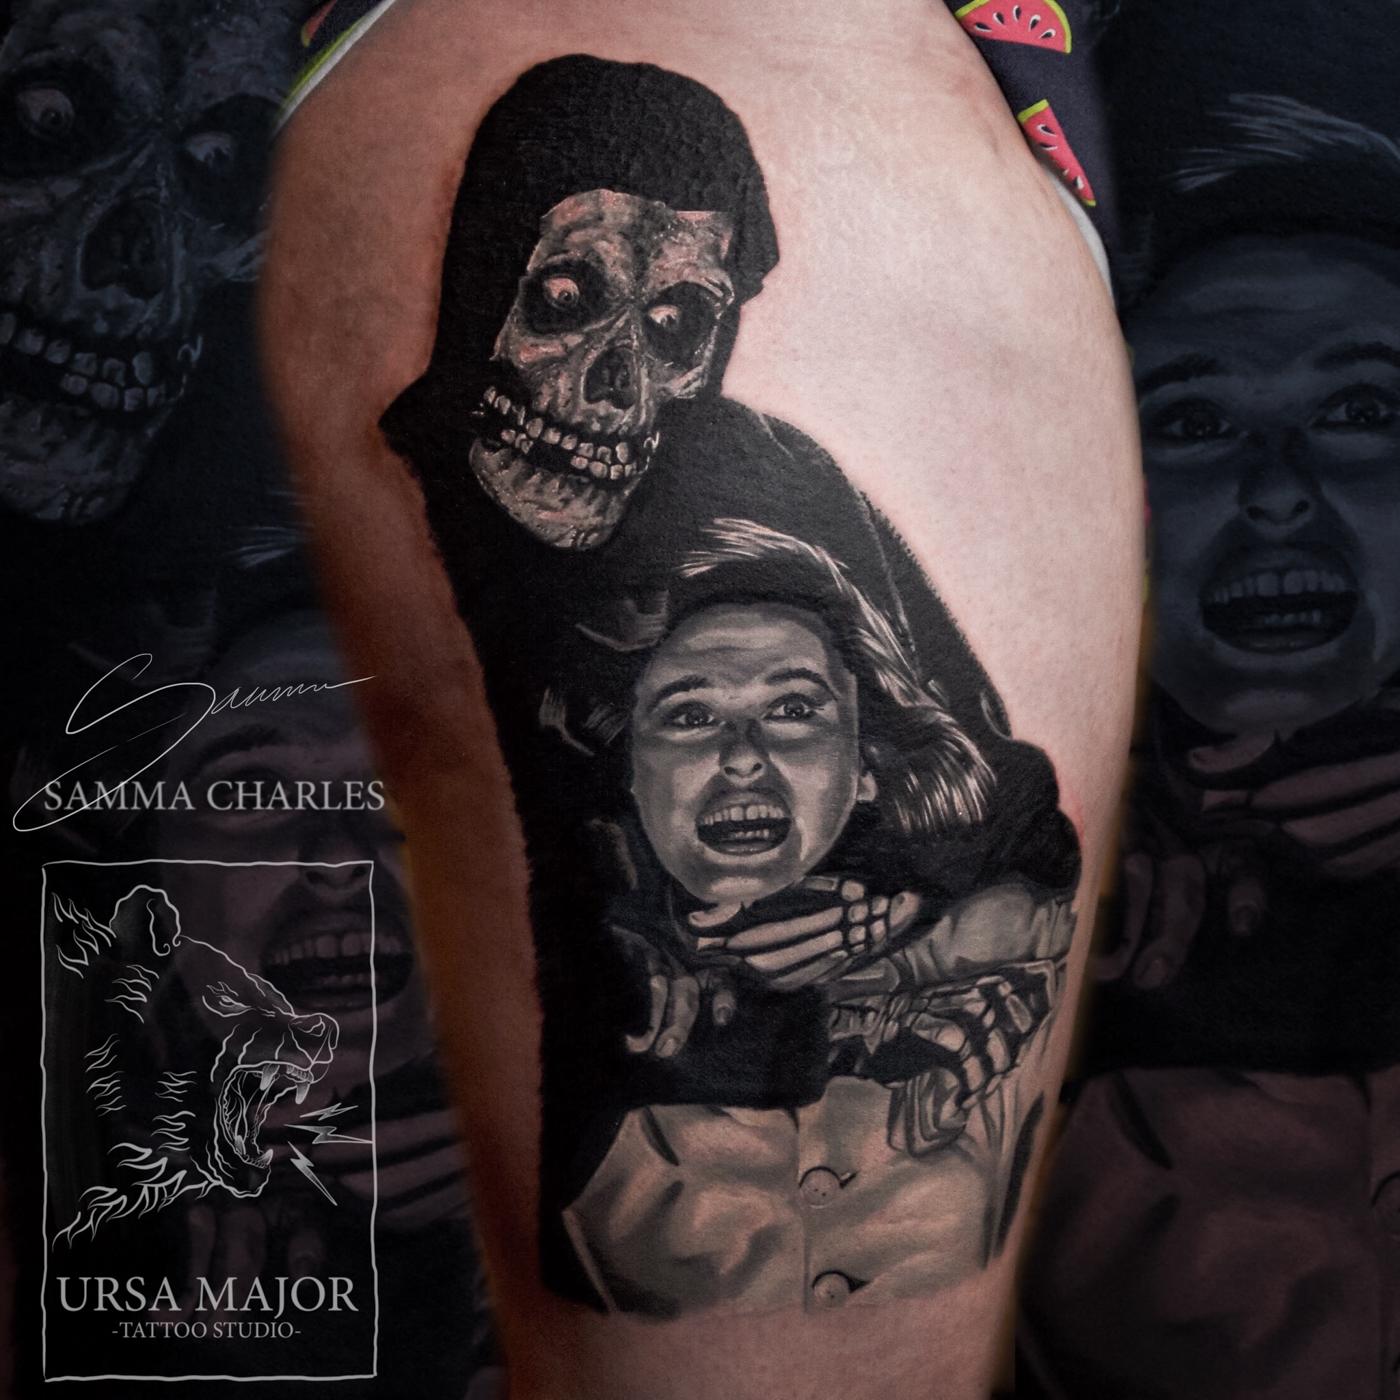 oxfordshire-tattoo-studio-35.jpg